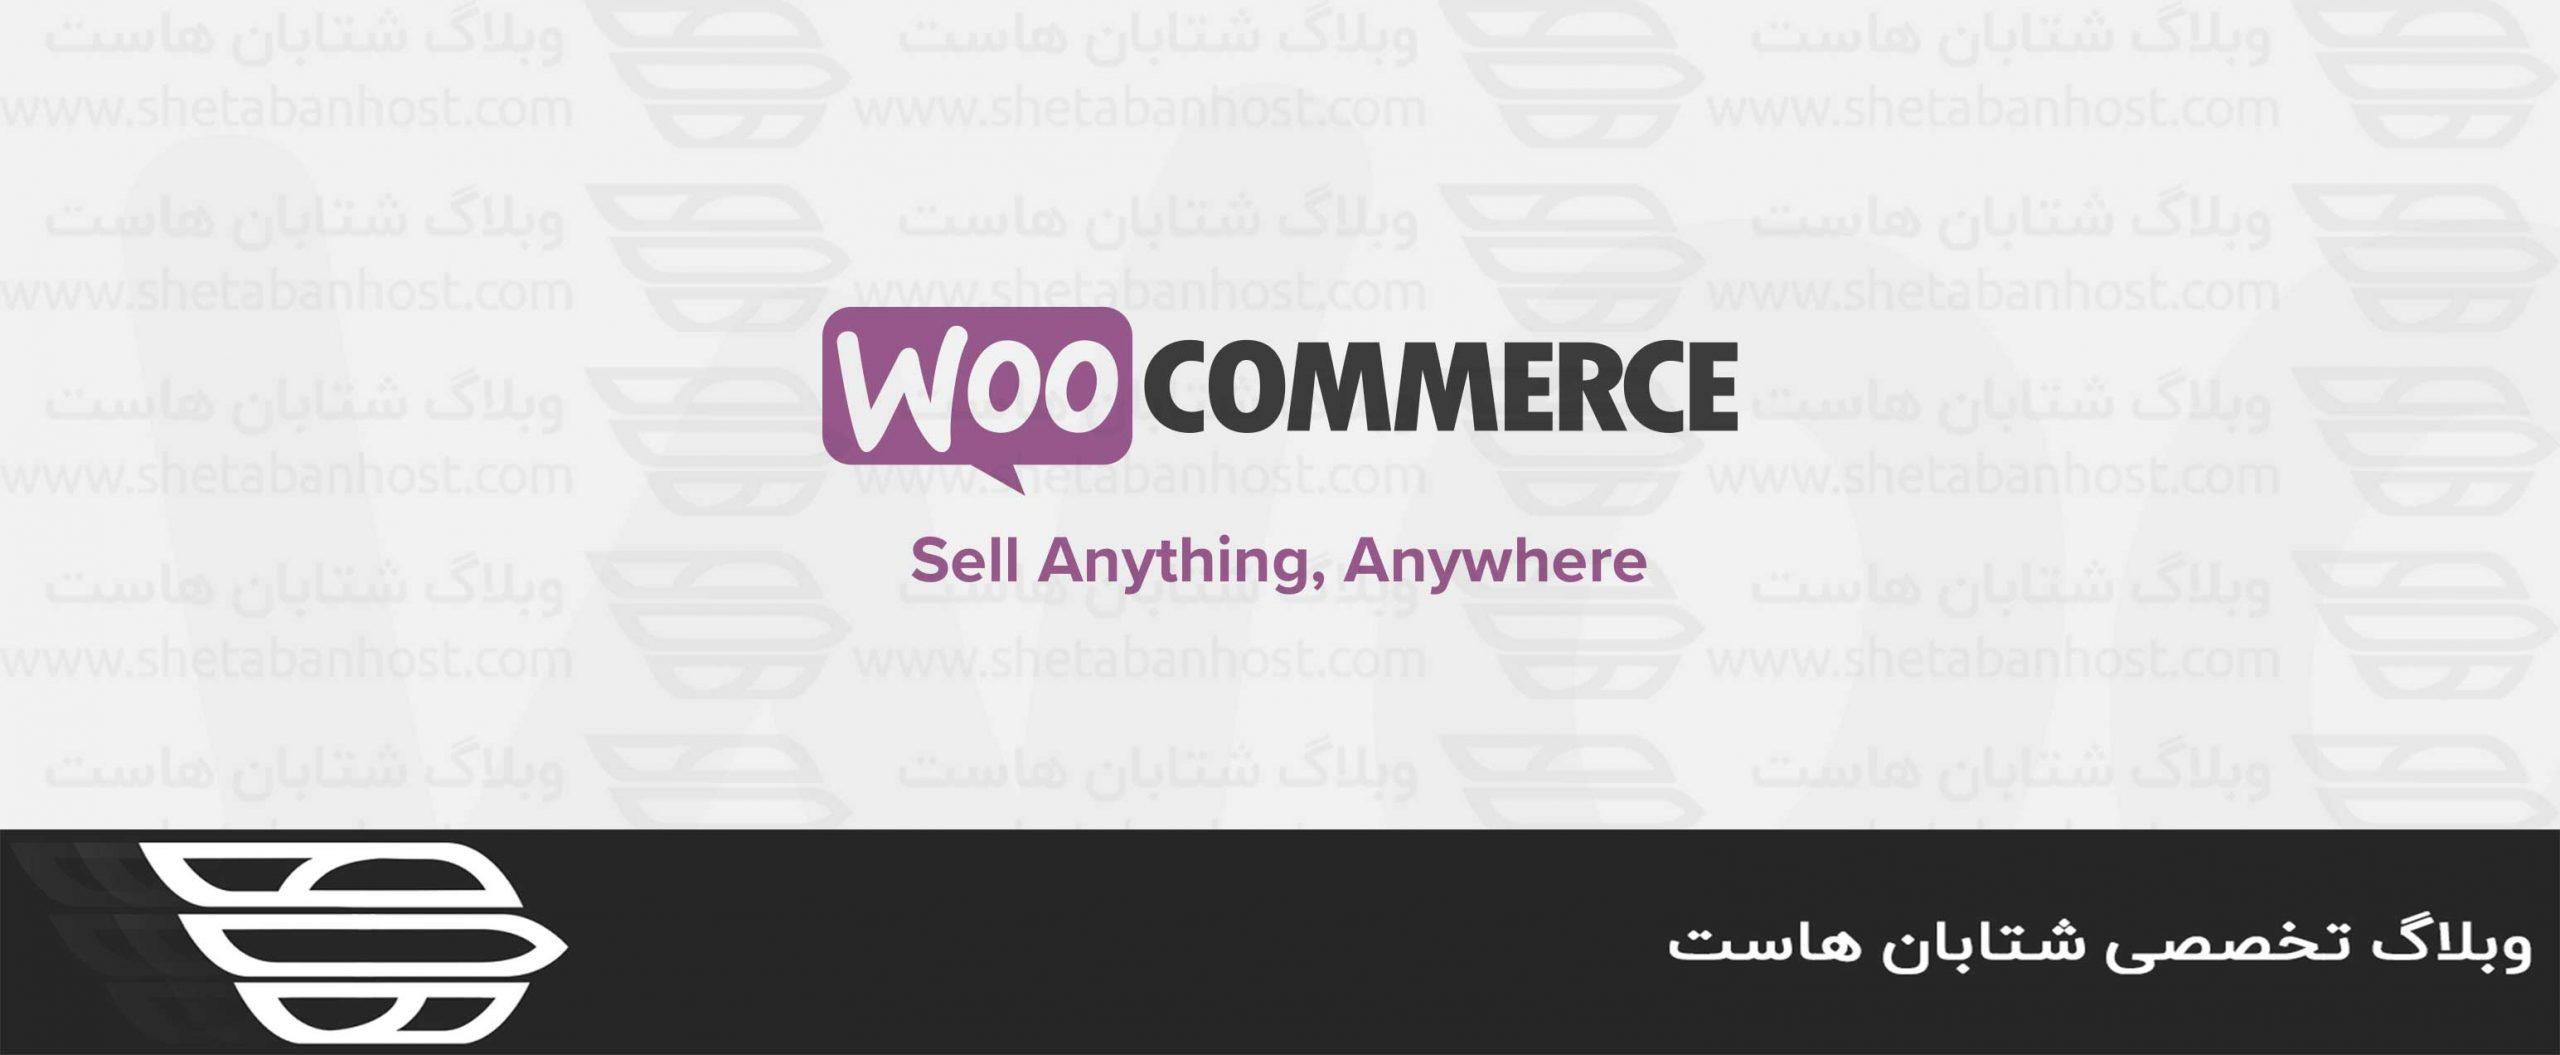 WooCommerce چیست